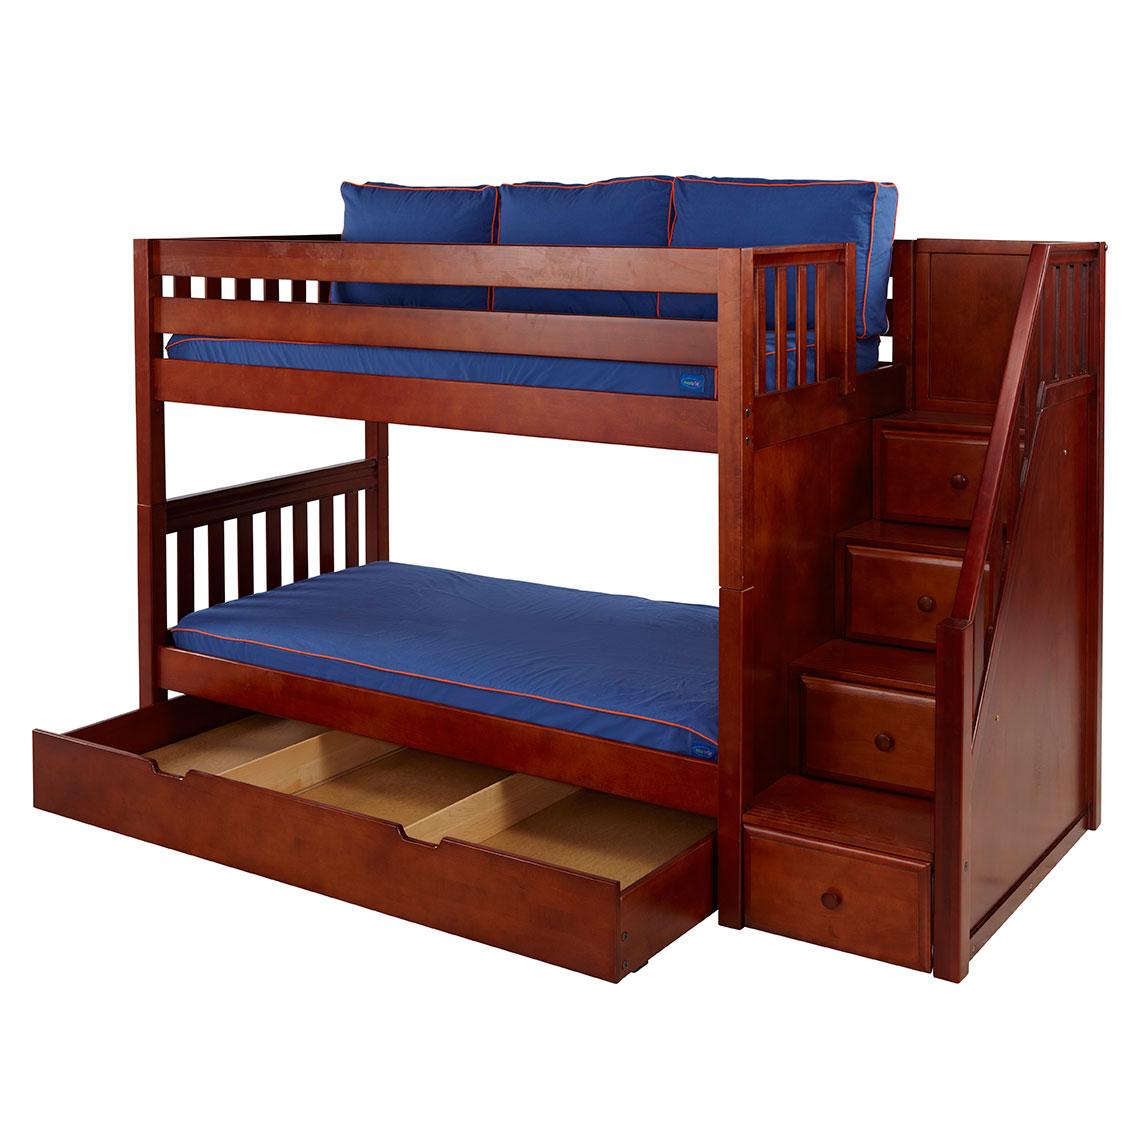 bunk beds OCZCPKA